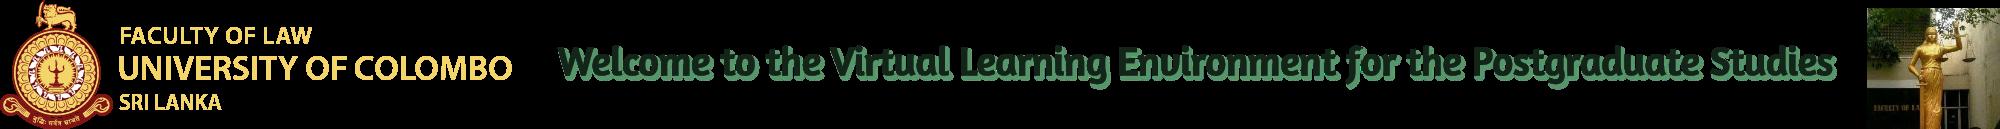 Virtual Learning Environment for the Postgraduate Studies